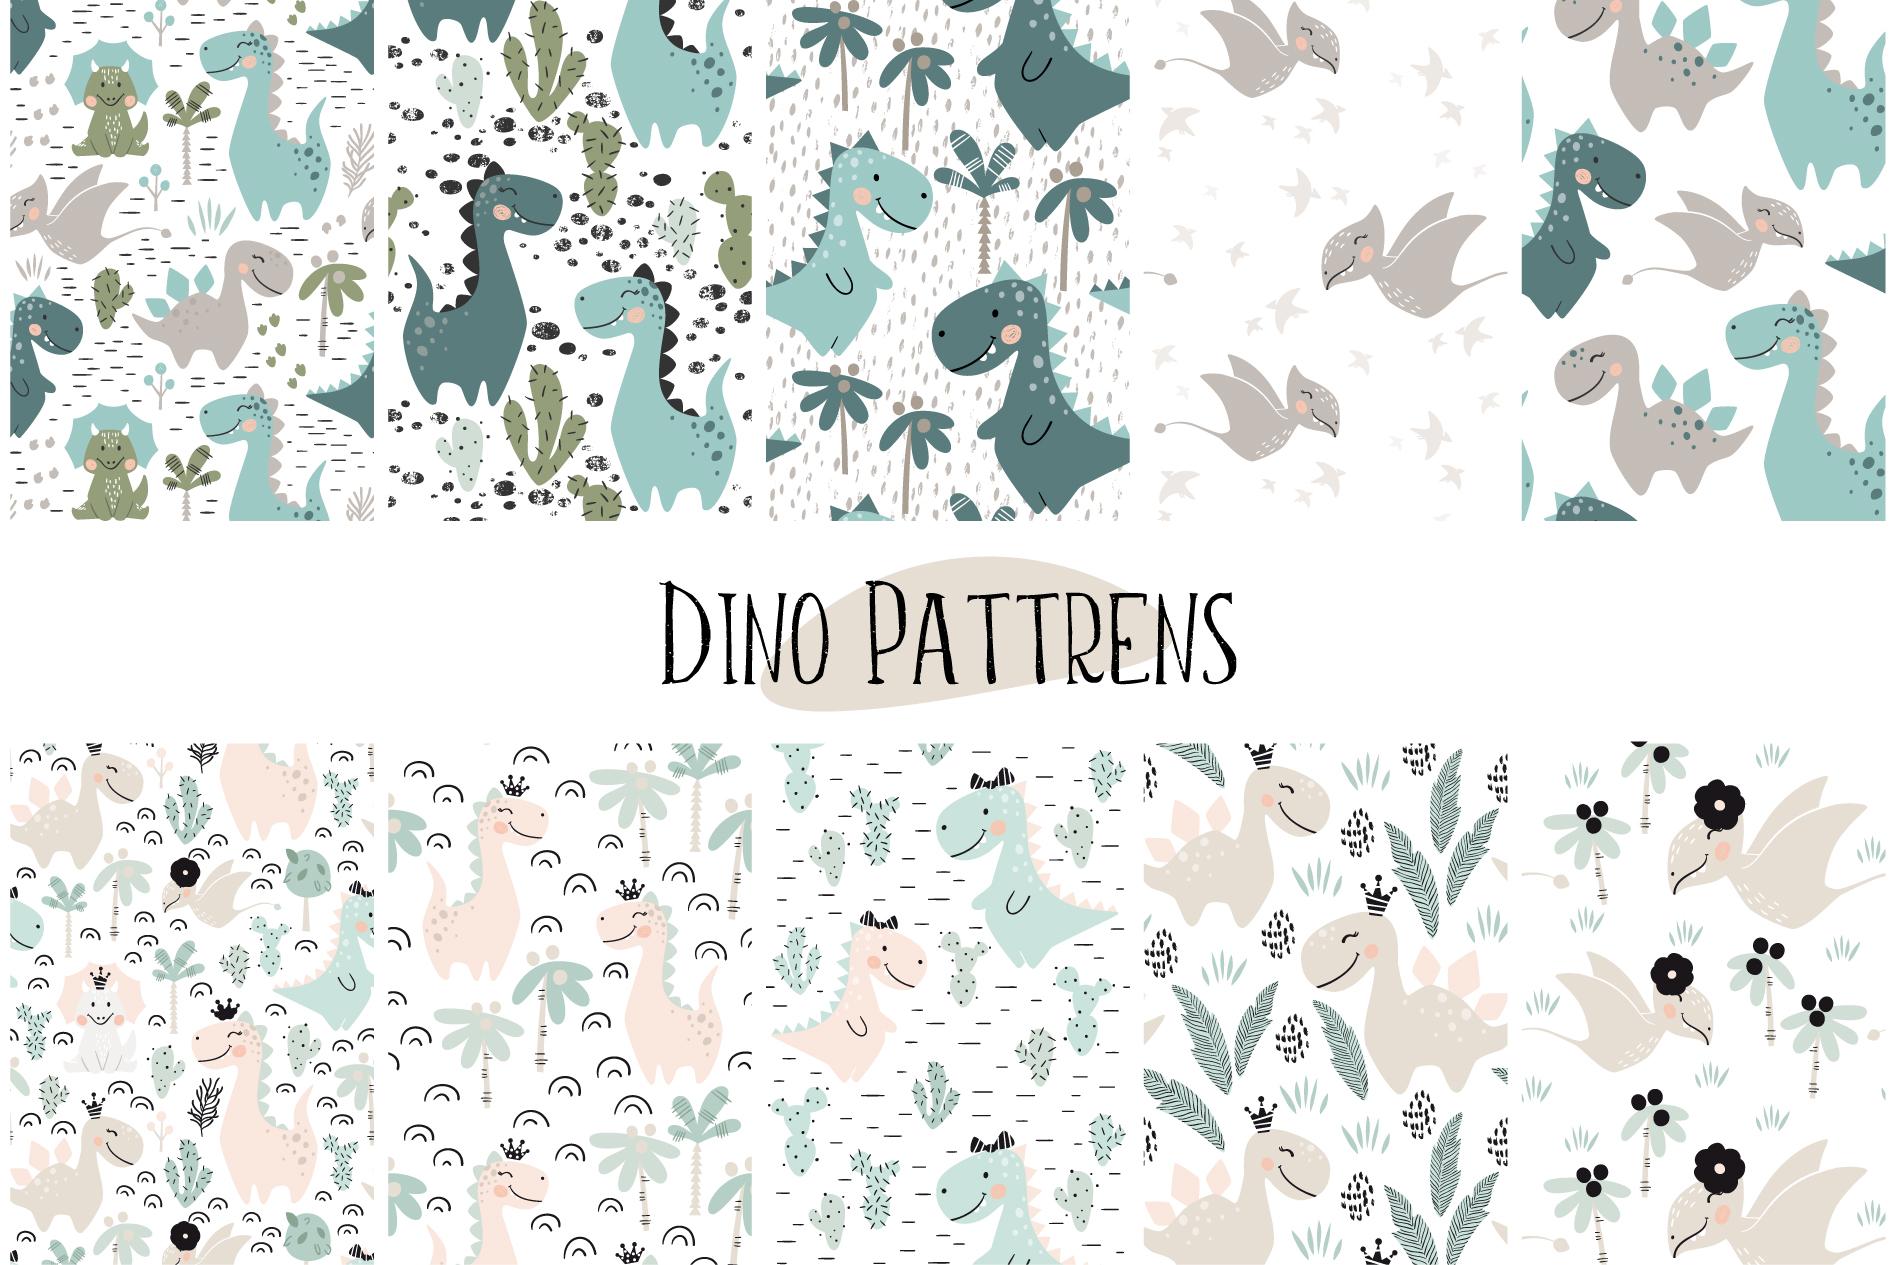 Dinosaurs example image 7